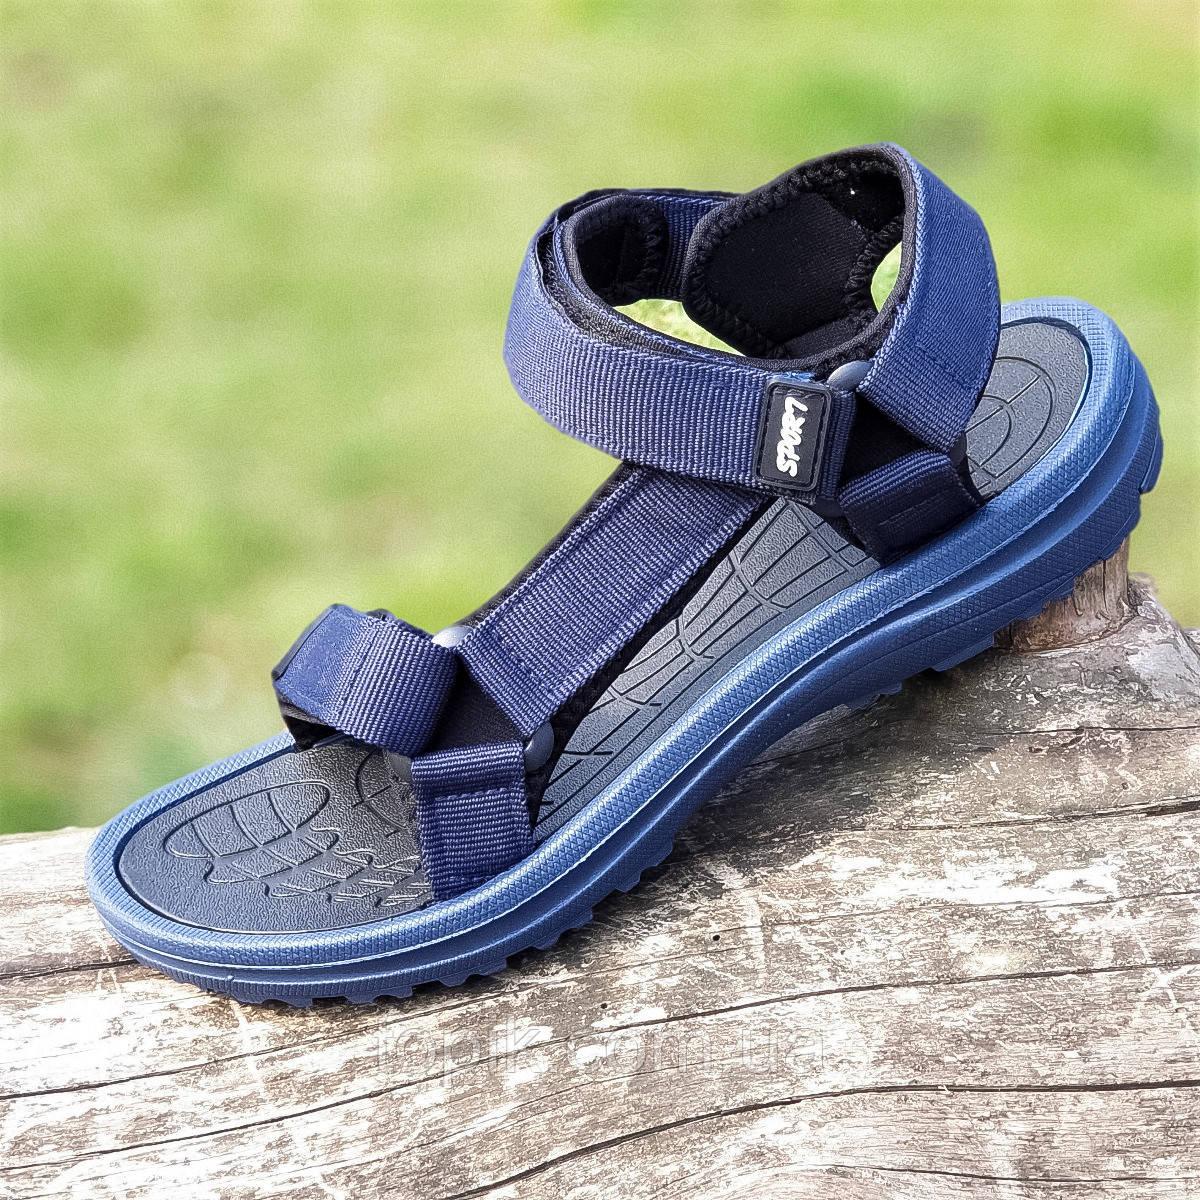 Босоножки сандалии мужские темно синие на липучках (Код: 1445)